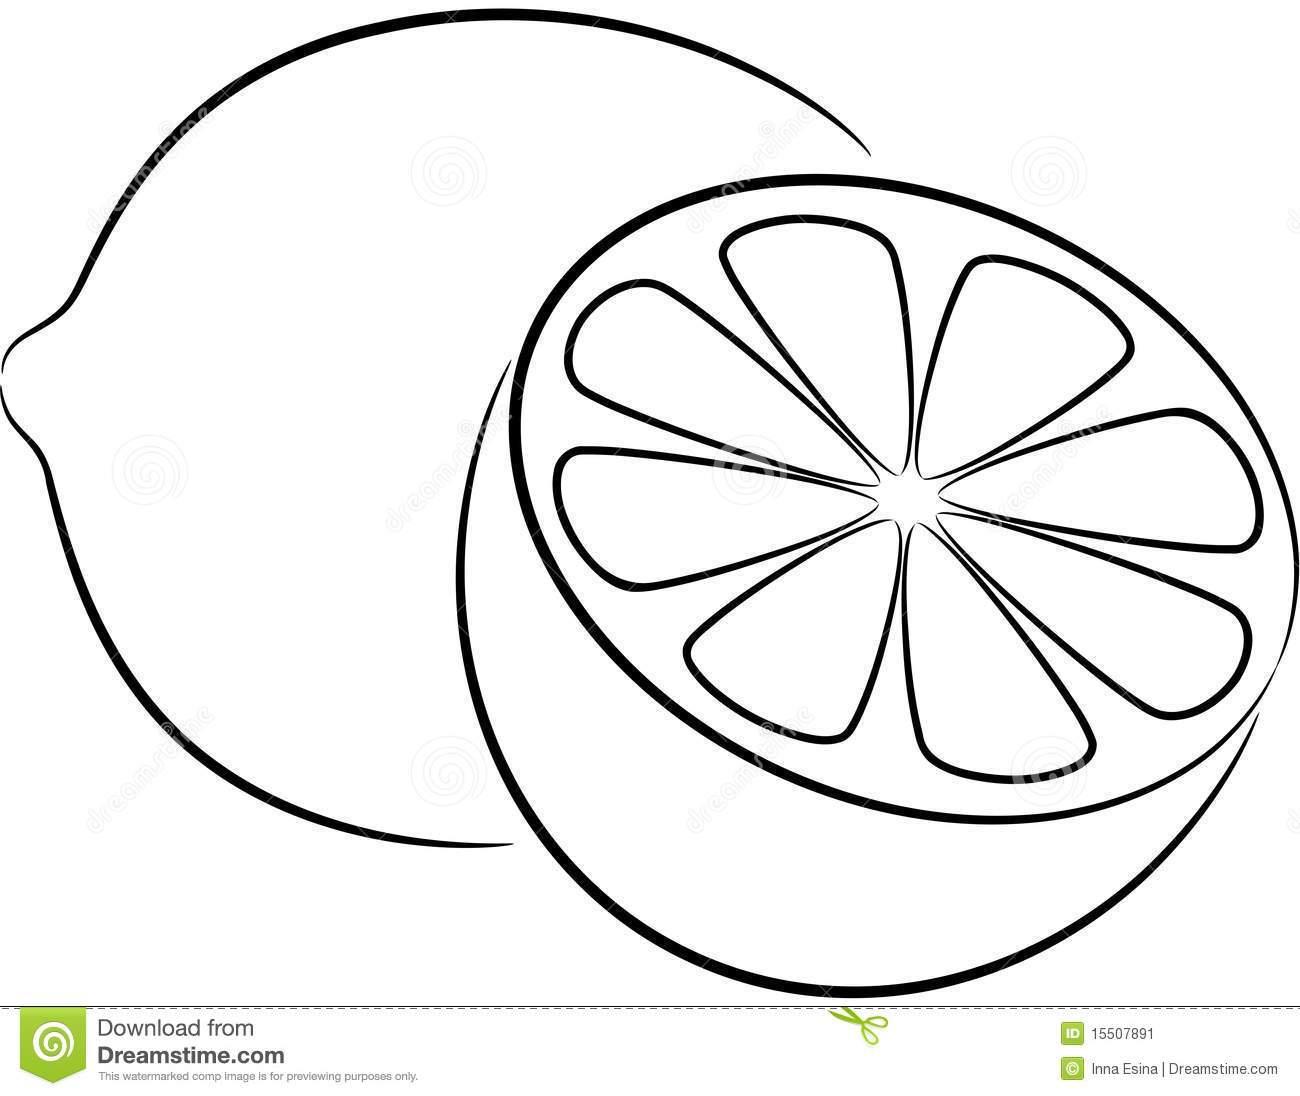 Clipart black and white lemon 2 » Clipart Portal.